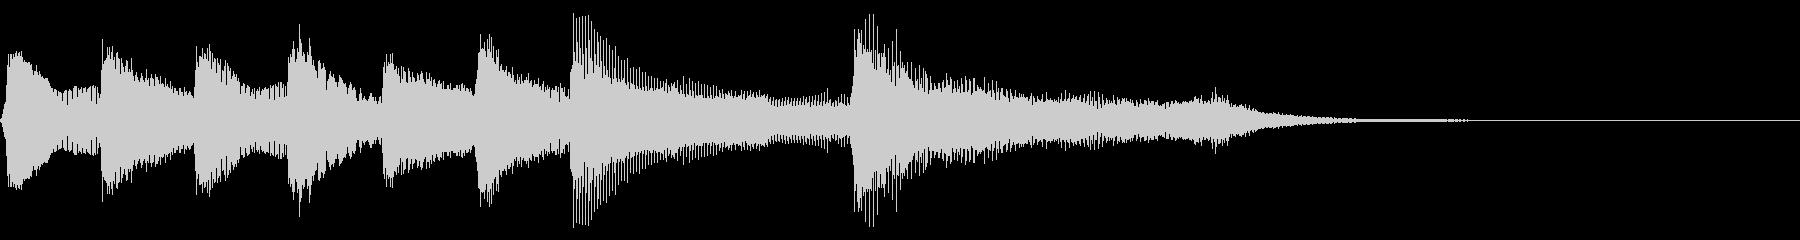 8bit レトロなクリア音 達成 完了の未再生の波形